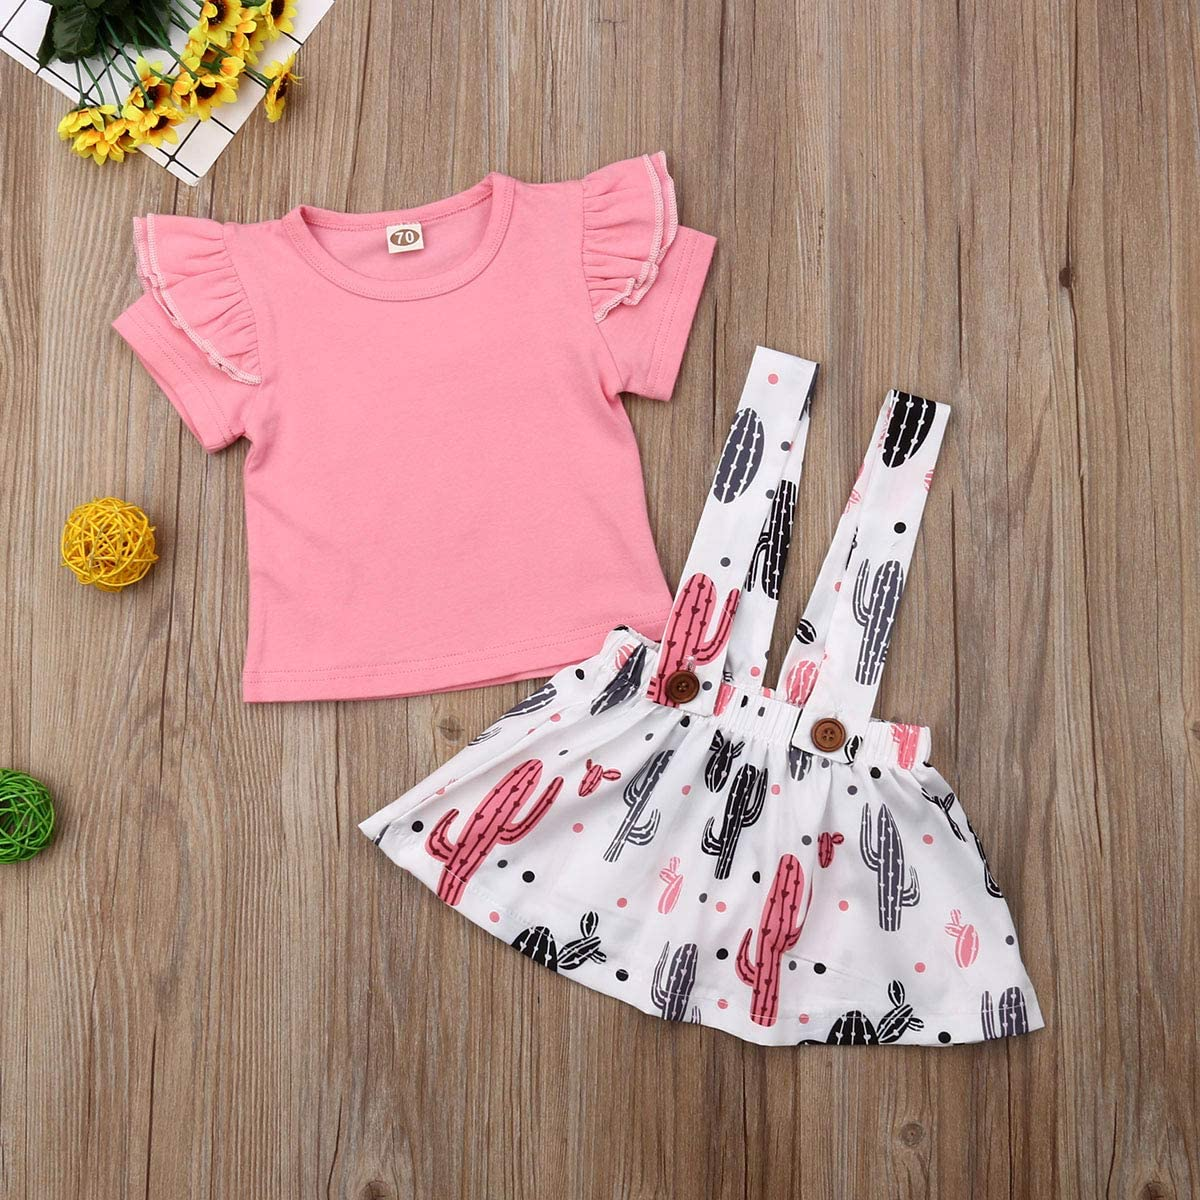 Jimanyang Newborn Infant Baby Girl Short Sleeve Ruffled T-Shirt Cactus Print Suspender Skirt Set 0-24 Months